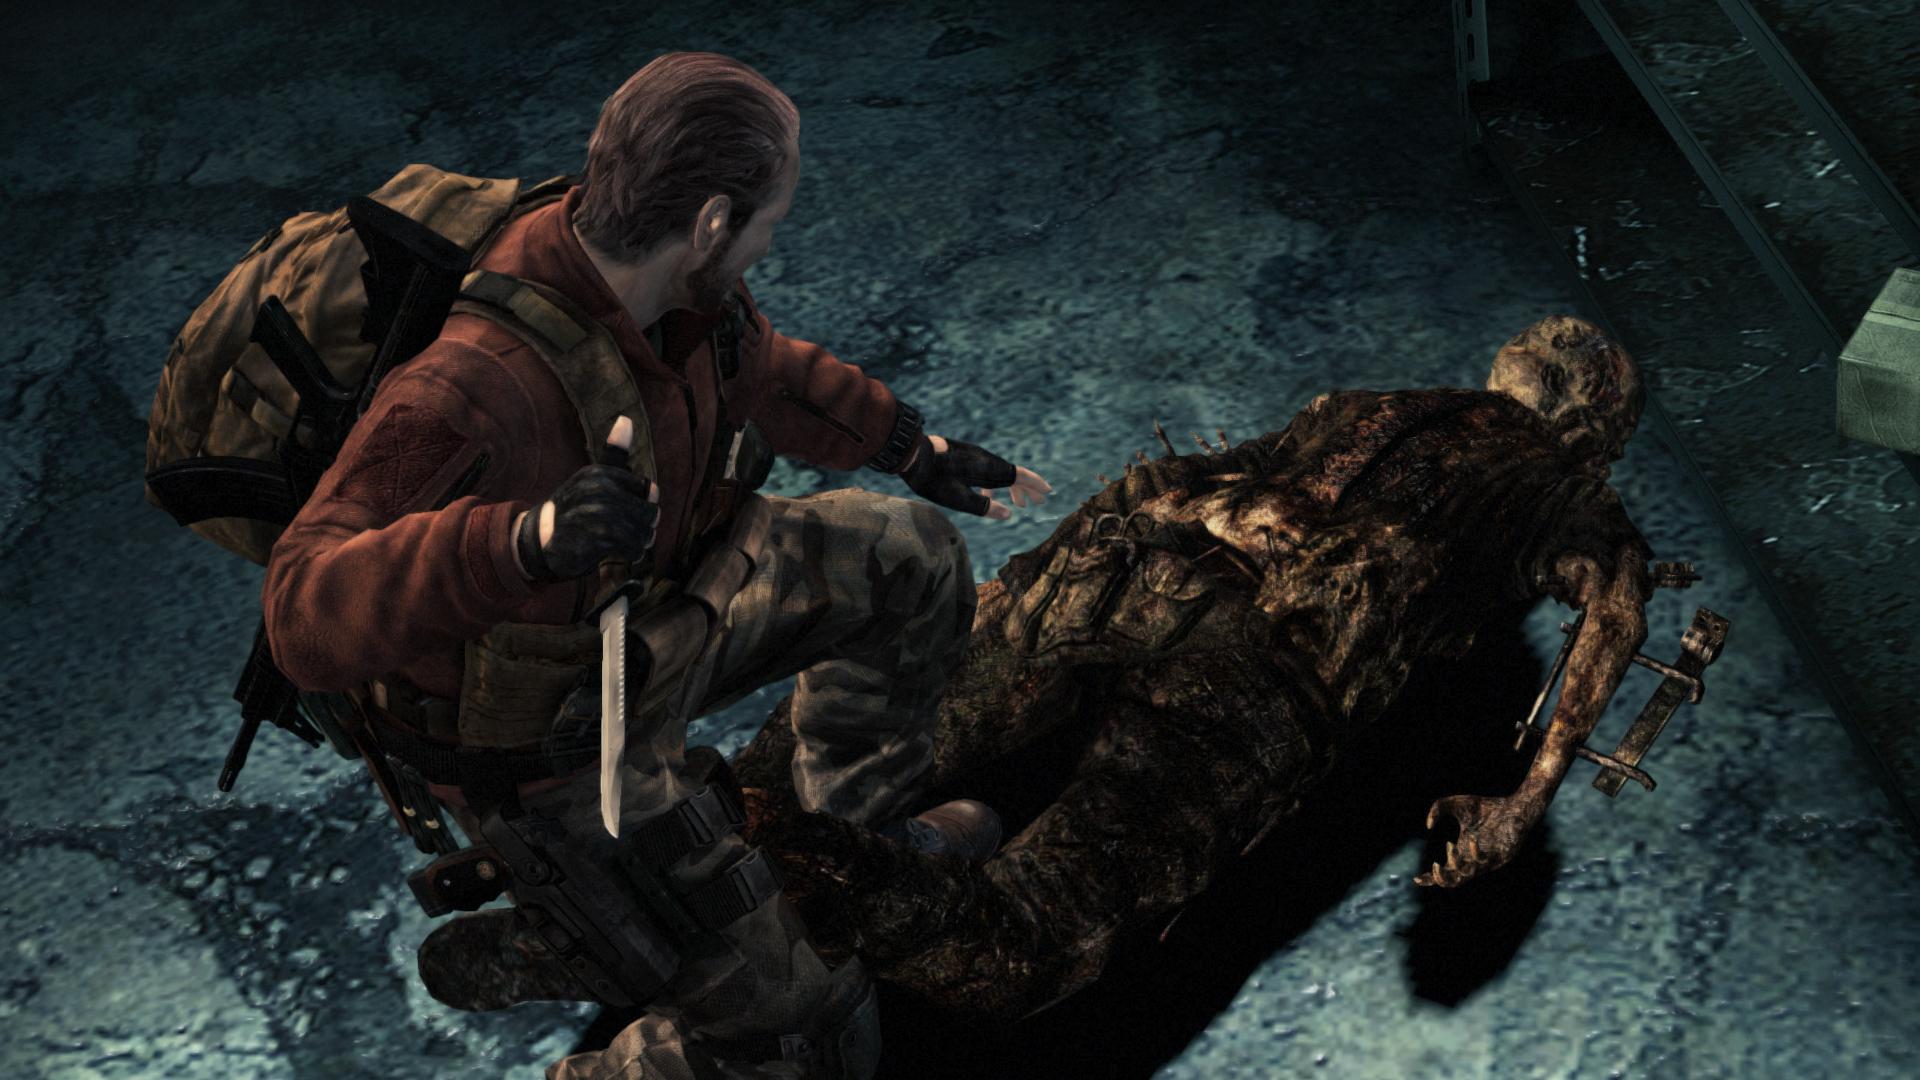 Resident Evil Revelations 2 / Biohazard Revelations 2 Ss_1056b02d563e3a596a242ac931edaa47441a1a01